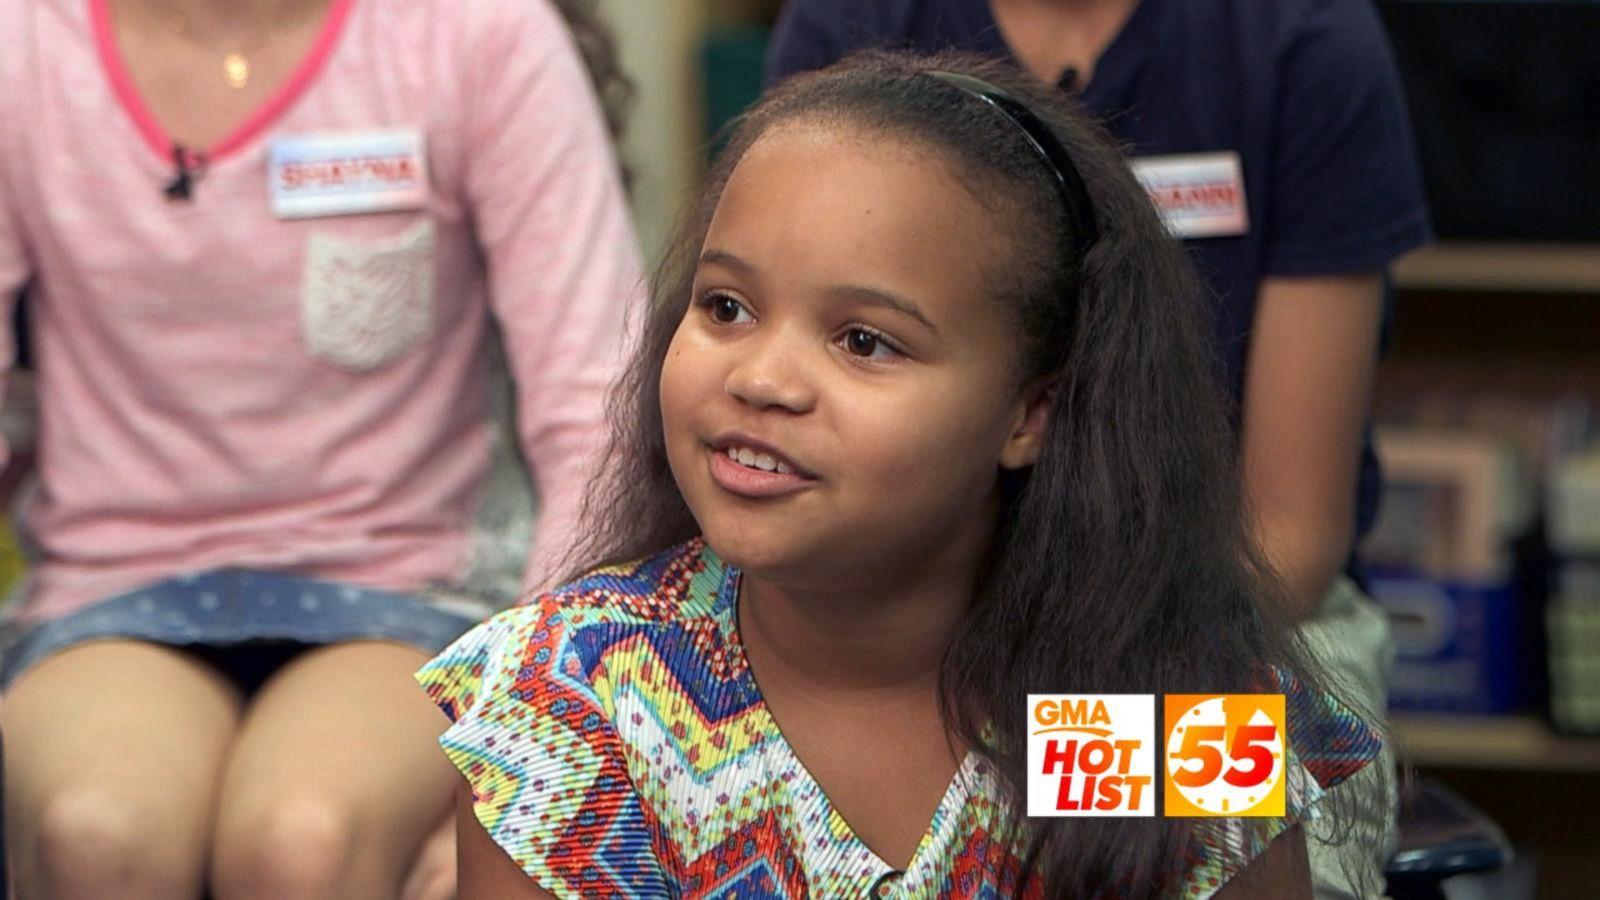 VIDEO: 'GMA' Hot List: Kids Talks Election 2016 and Lady Gaga Live